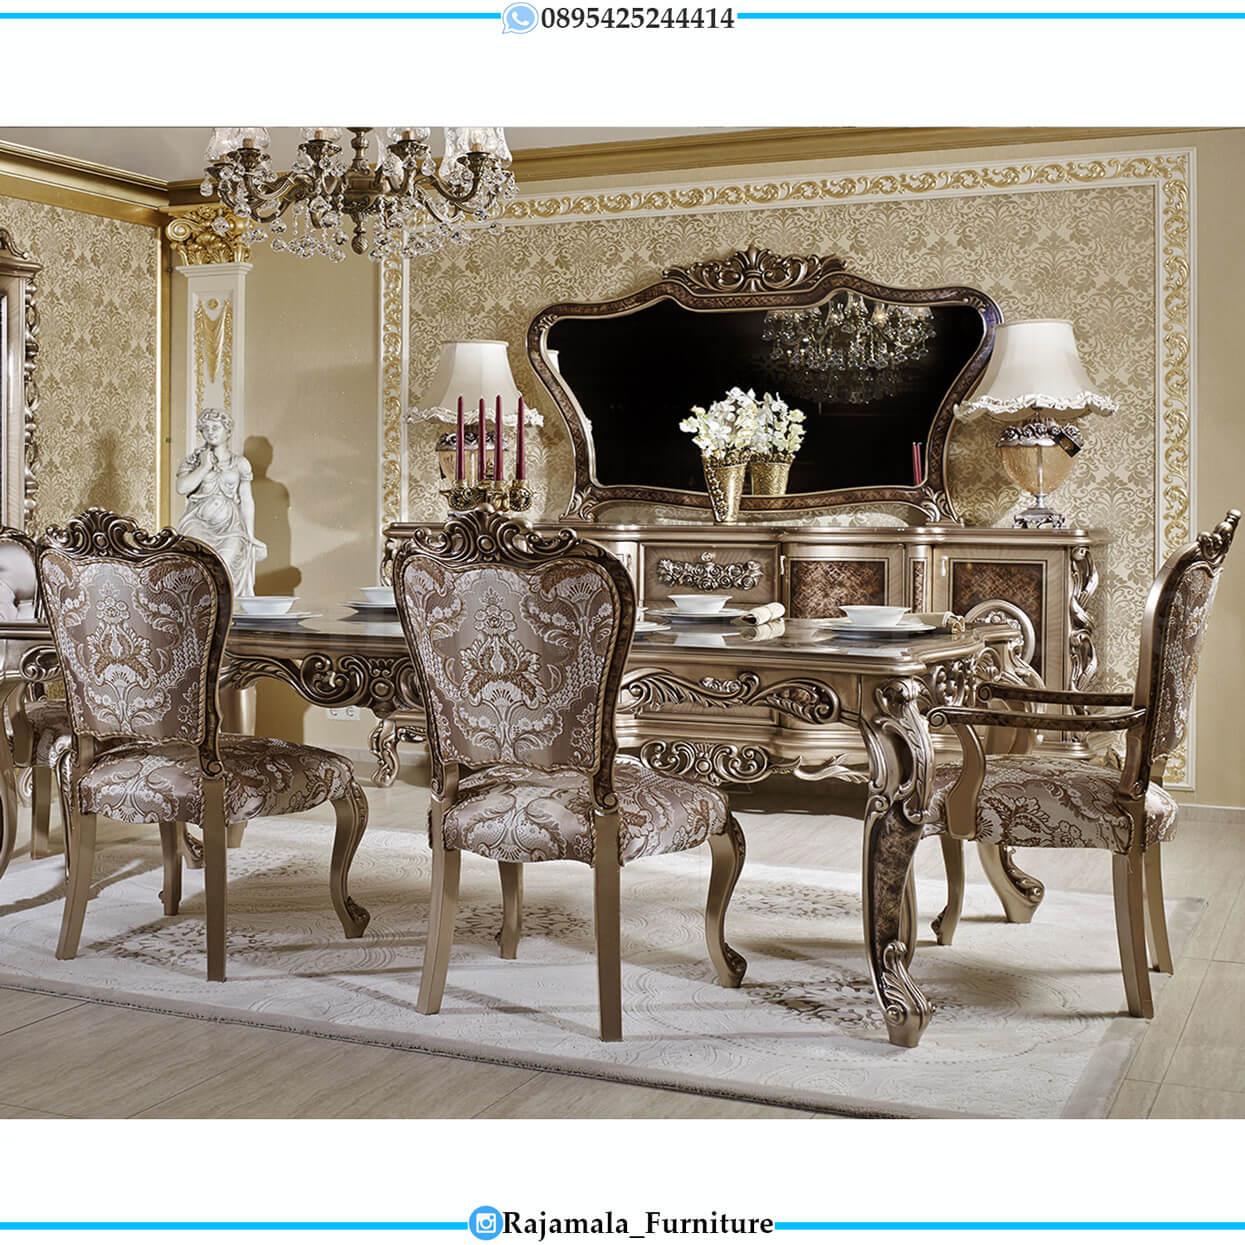 Meja Makan Mewah Kursi 6 Luxury Carving Classic Silver Shadow Color RM-0461